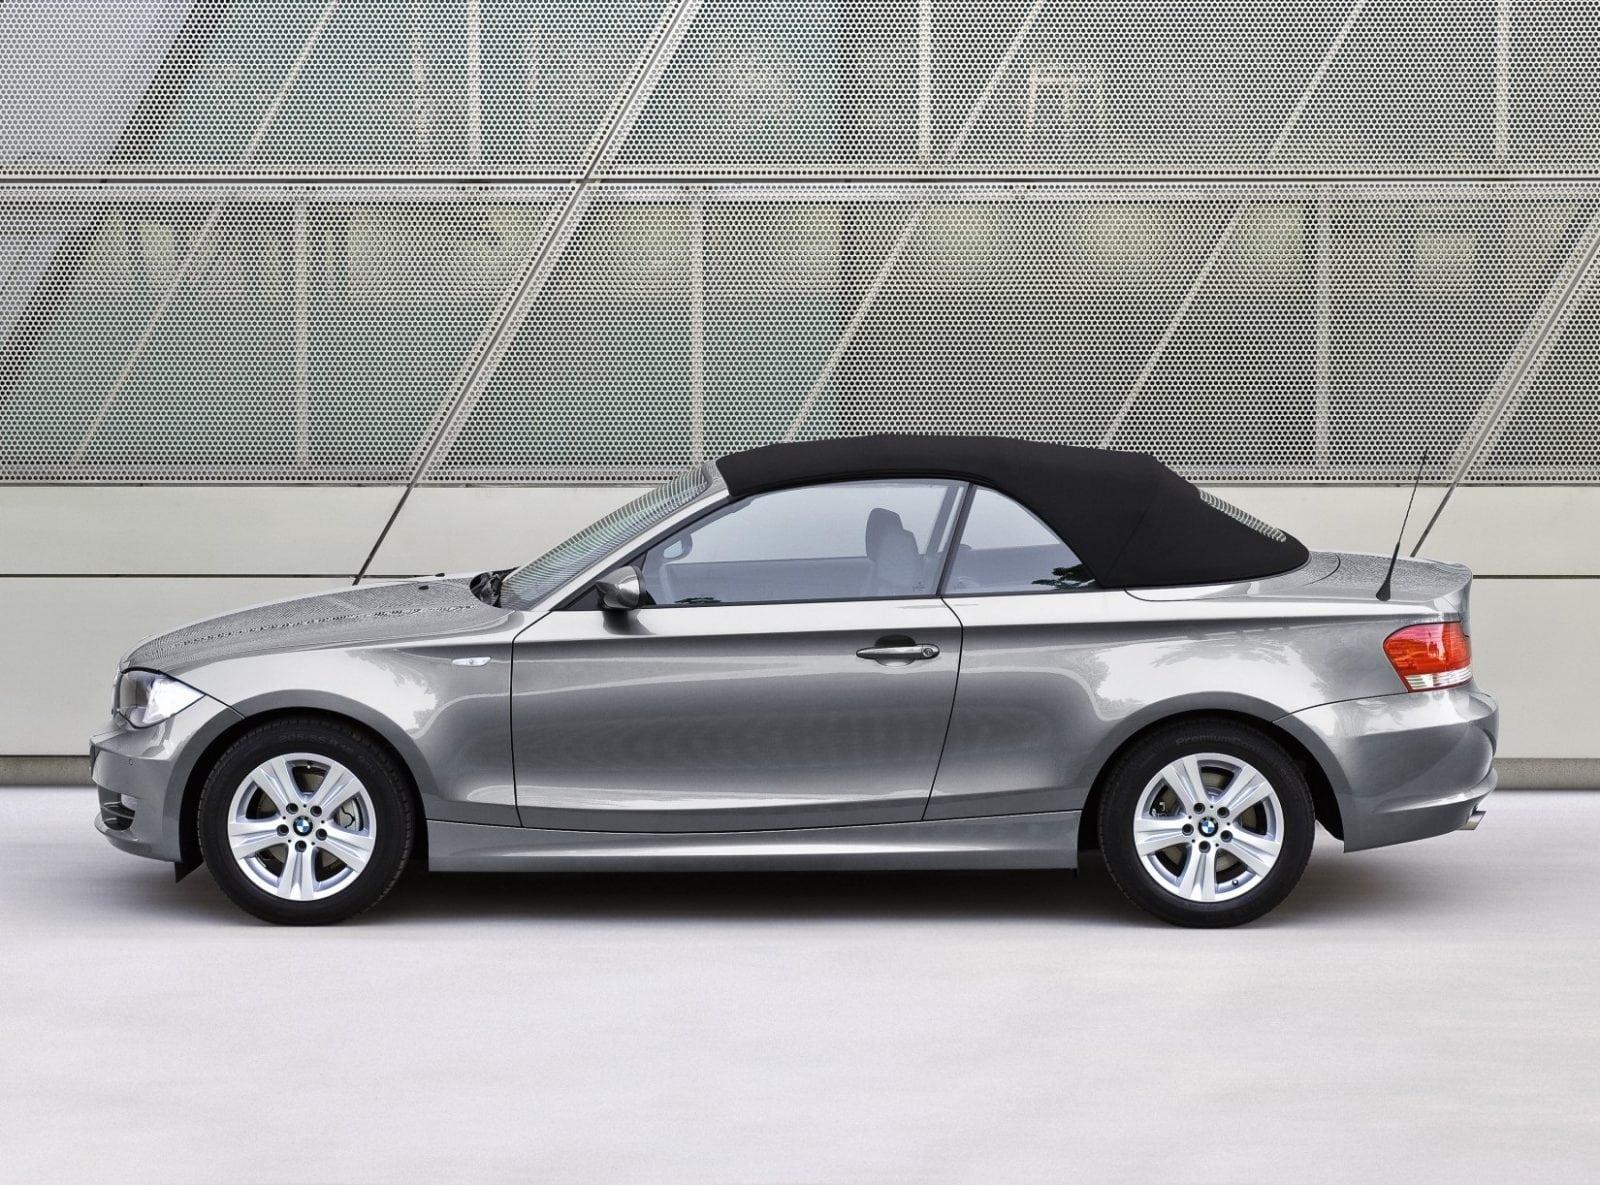 BMW E88 118d Cabrio 2009 Model Year-1